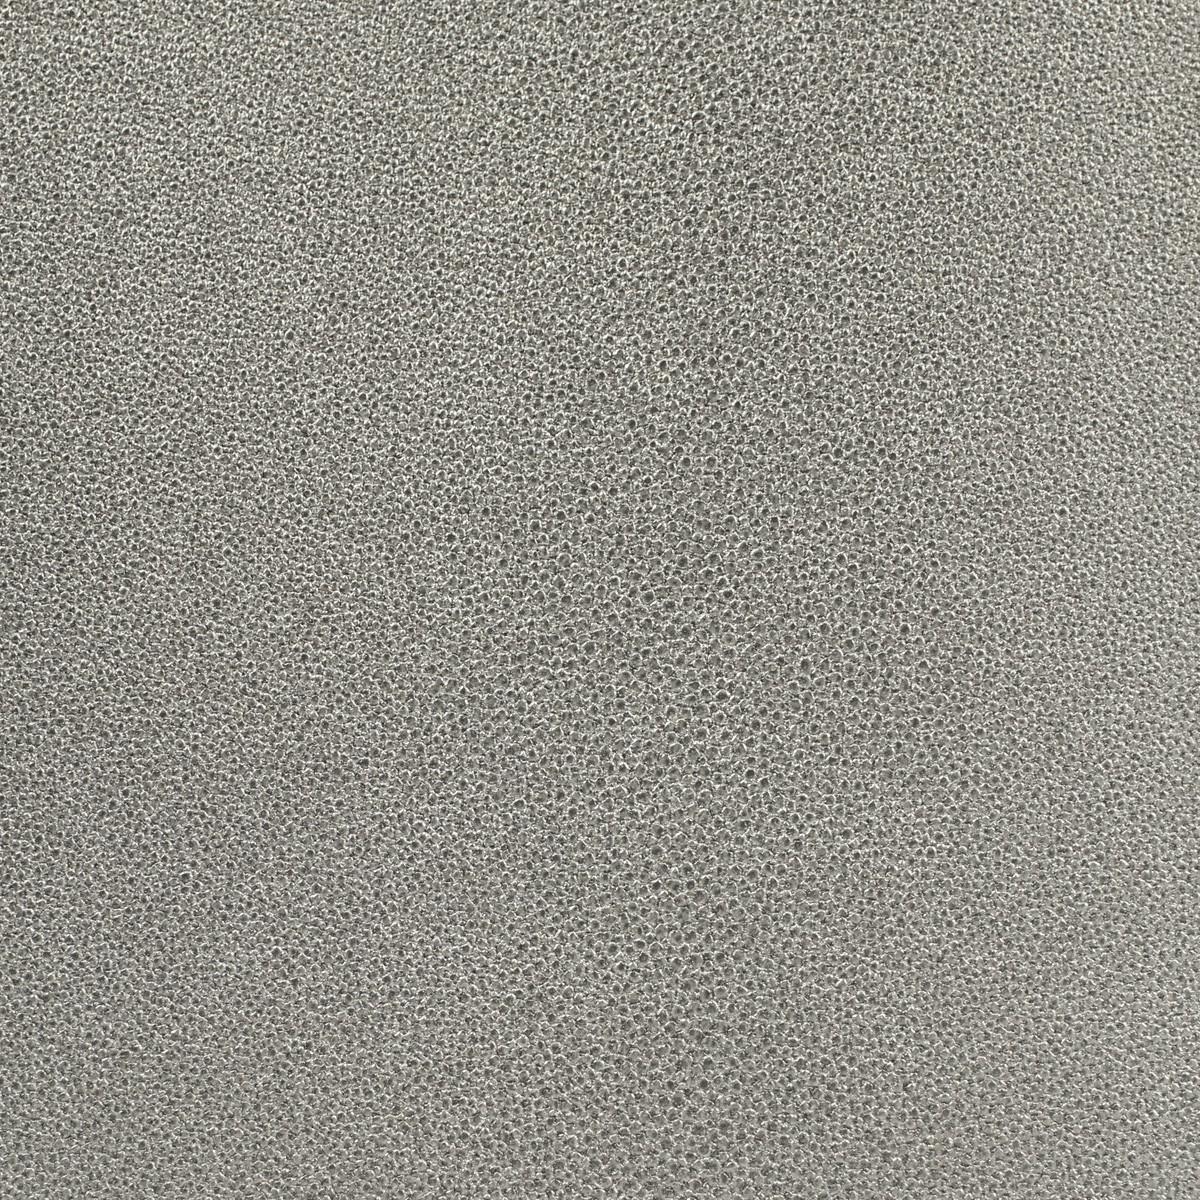 Vliestapete Gloockler Uni Struktur Silber Metallic